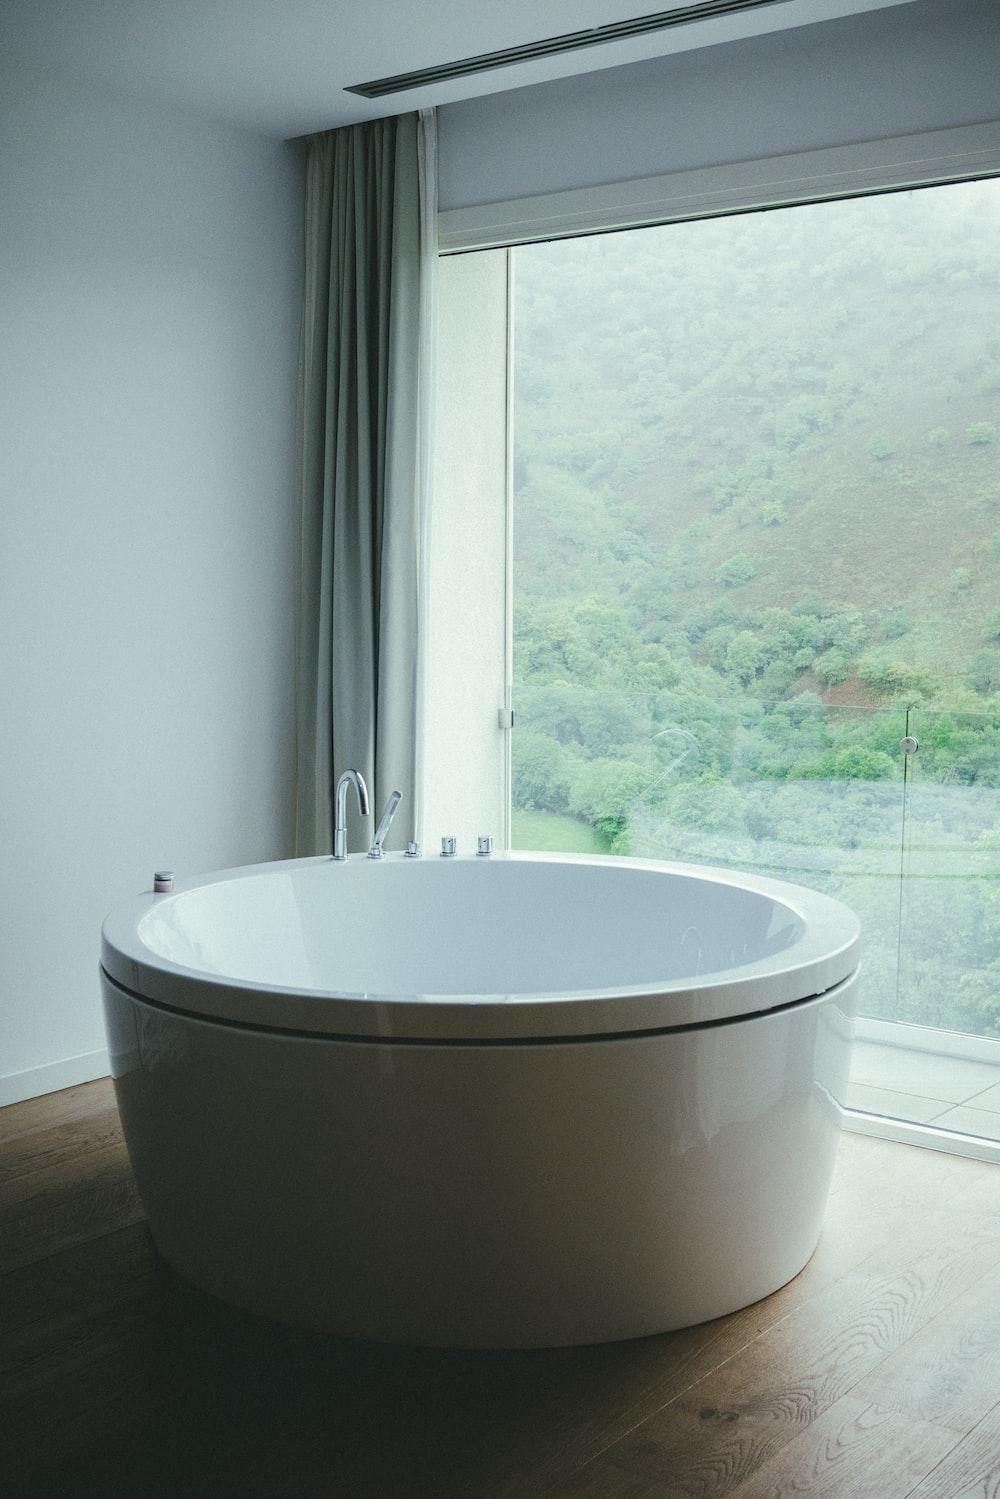 round white ceramic bathtub